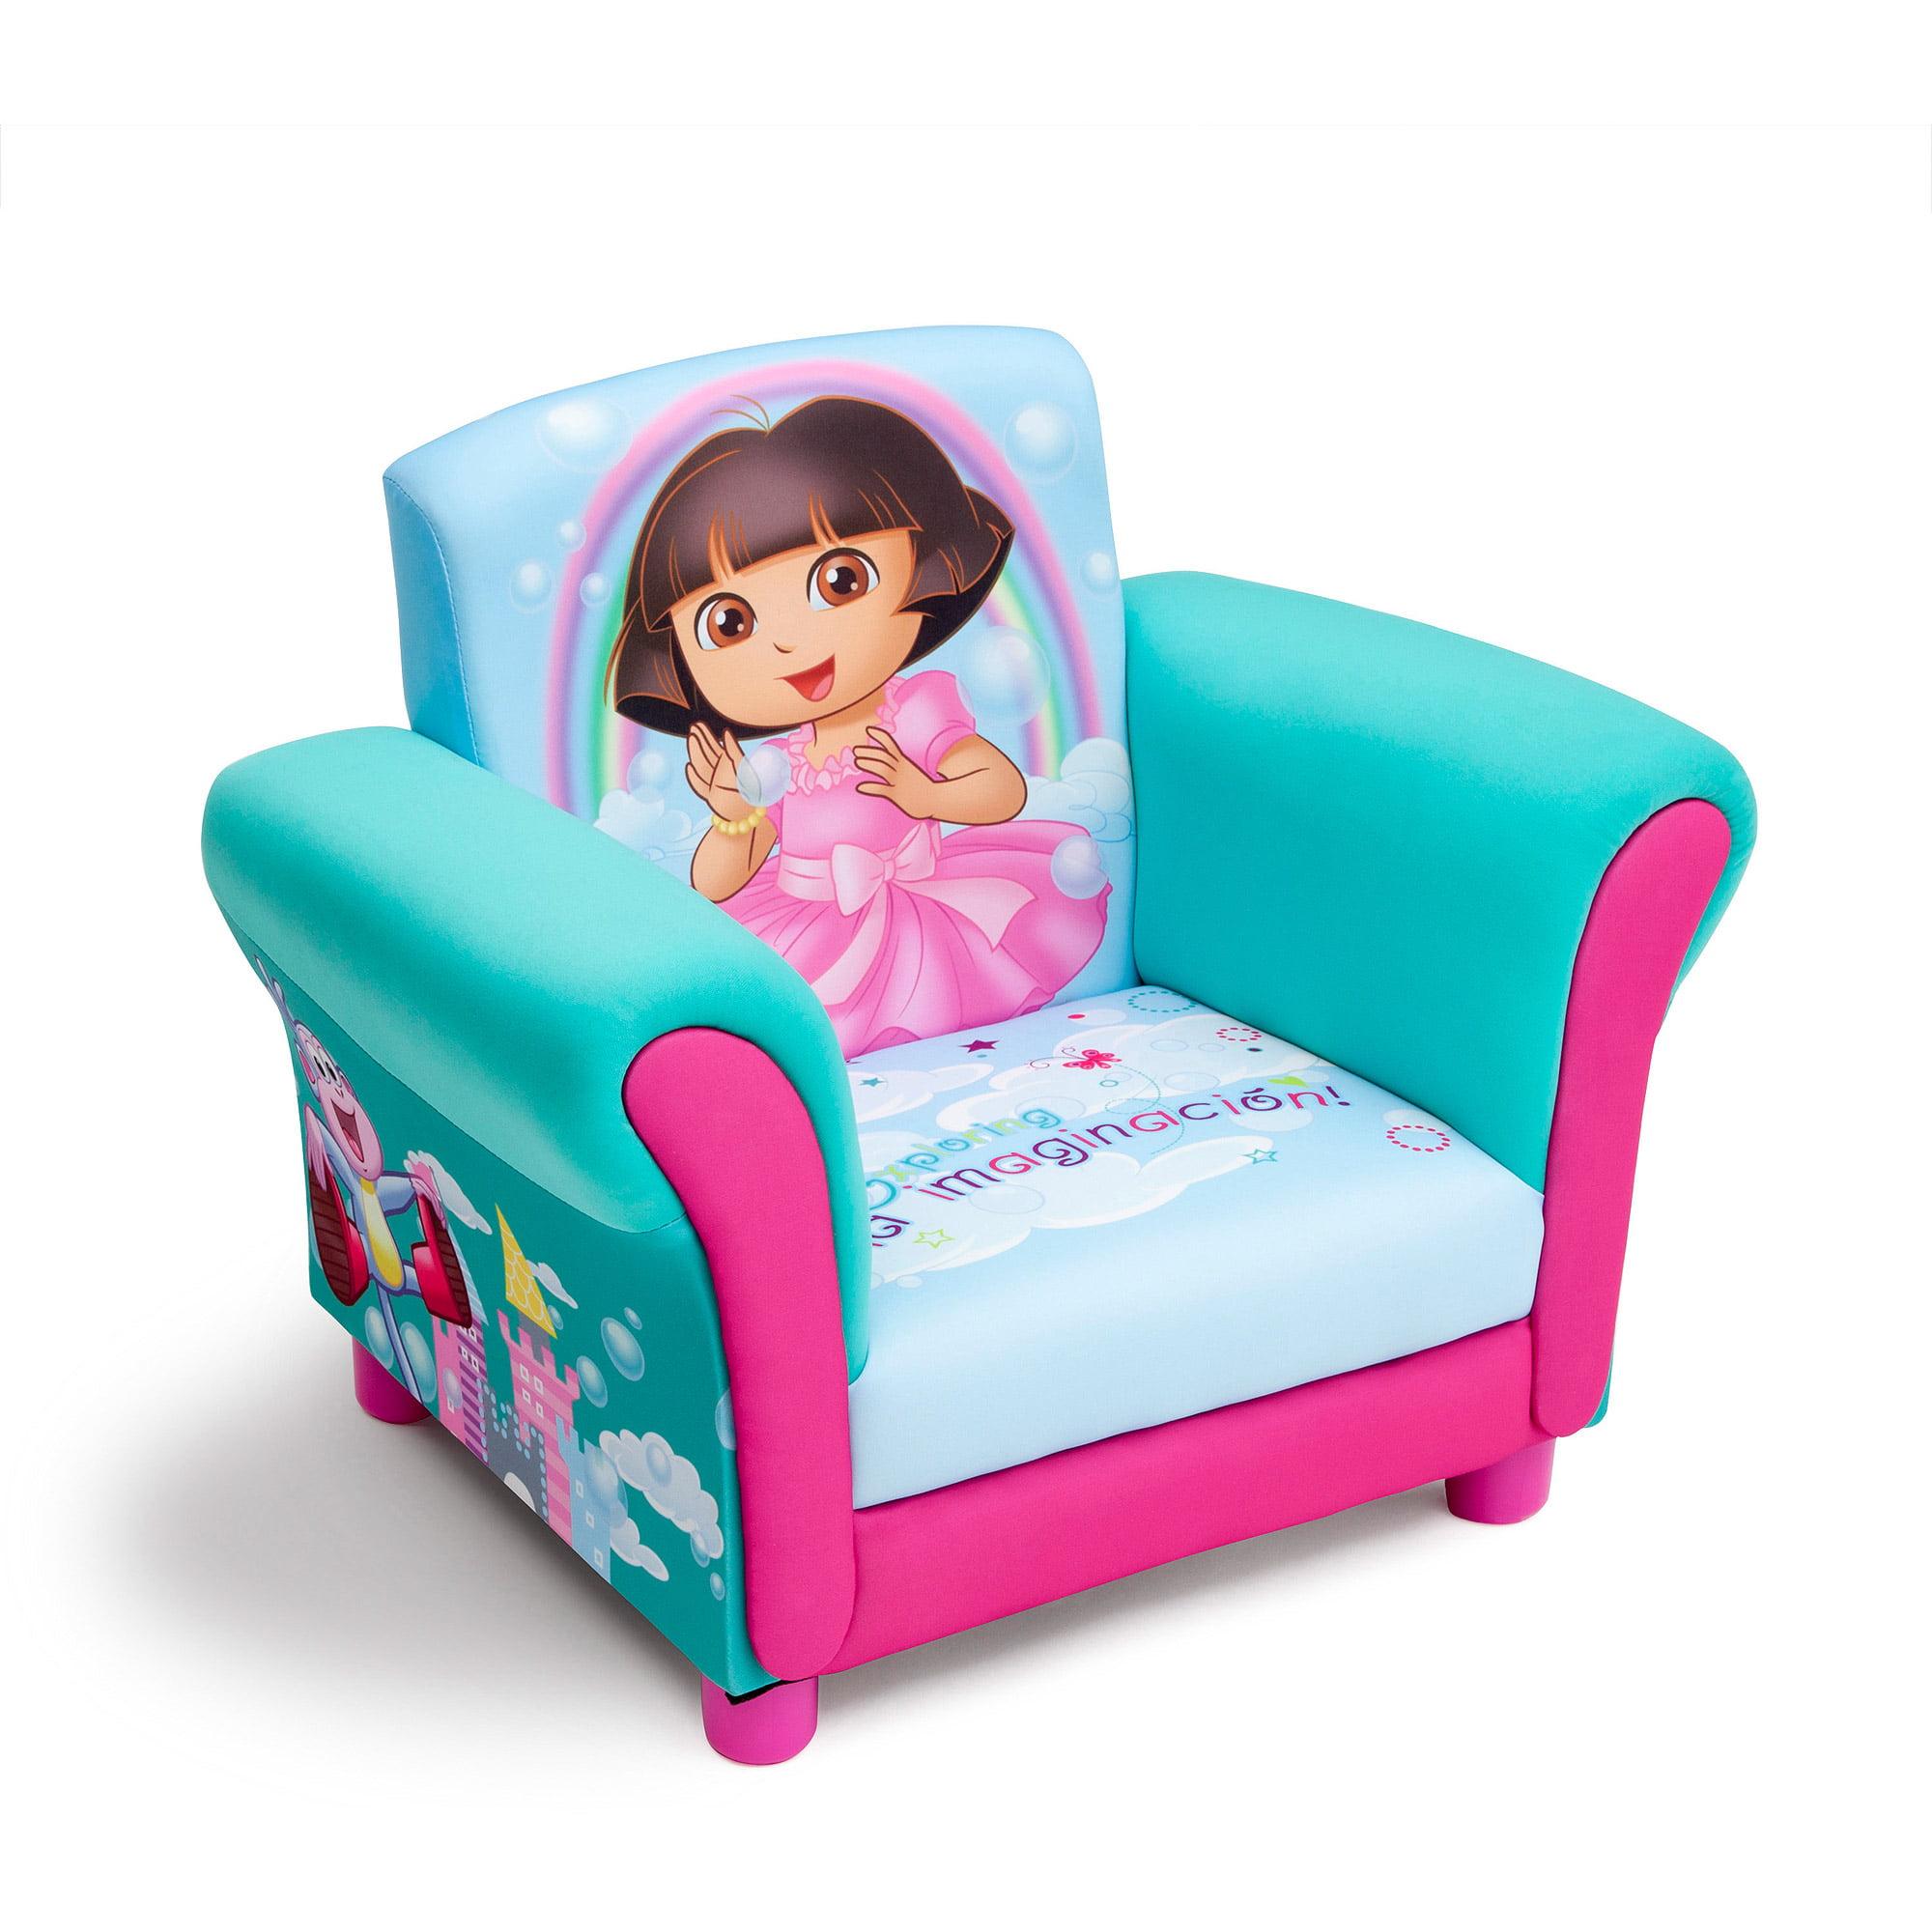 Delta Children's Products Nickelodeon Dora Upholstered Chair